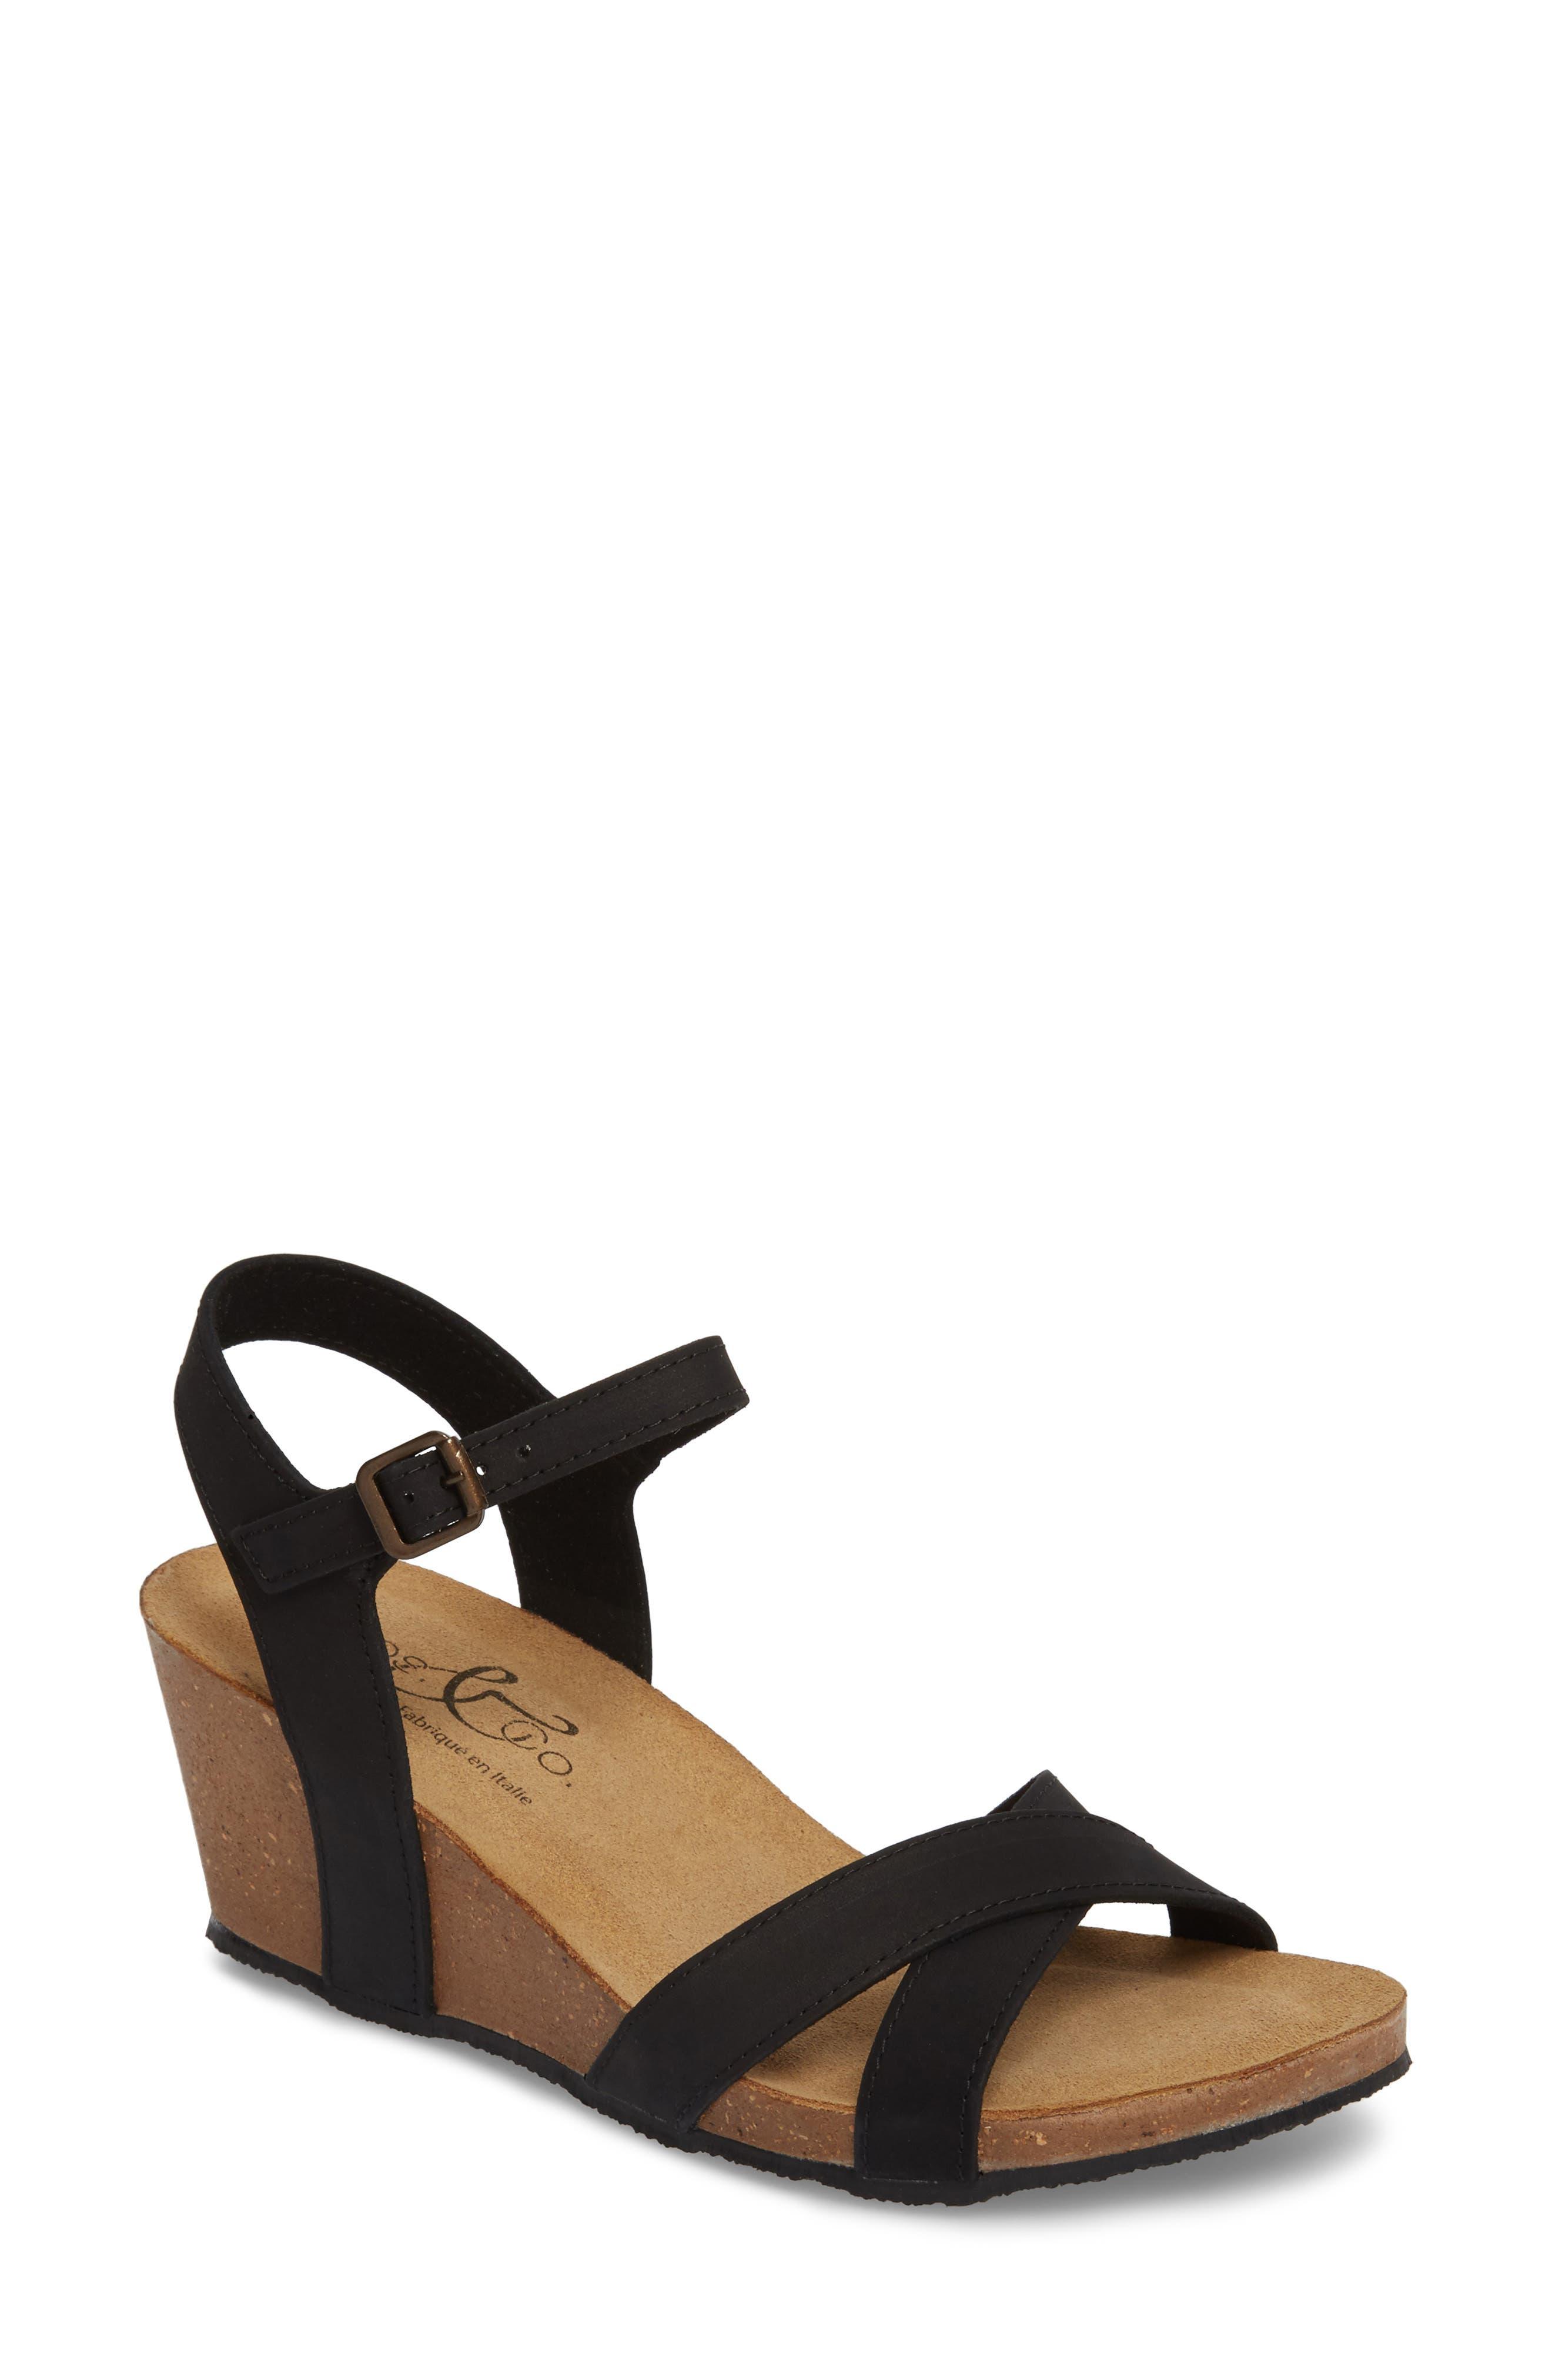 Bos. & Co. Lucca Wedge Sandal, Black